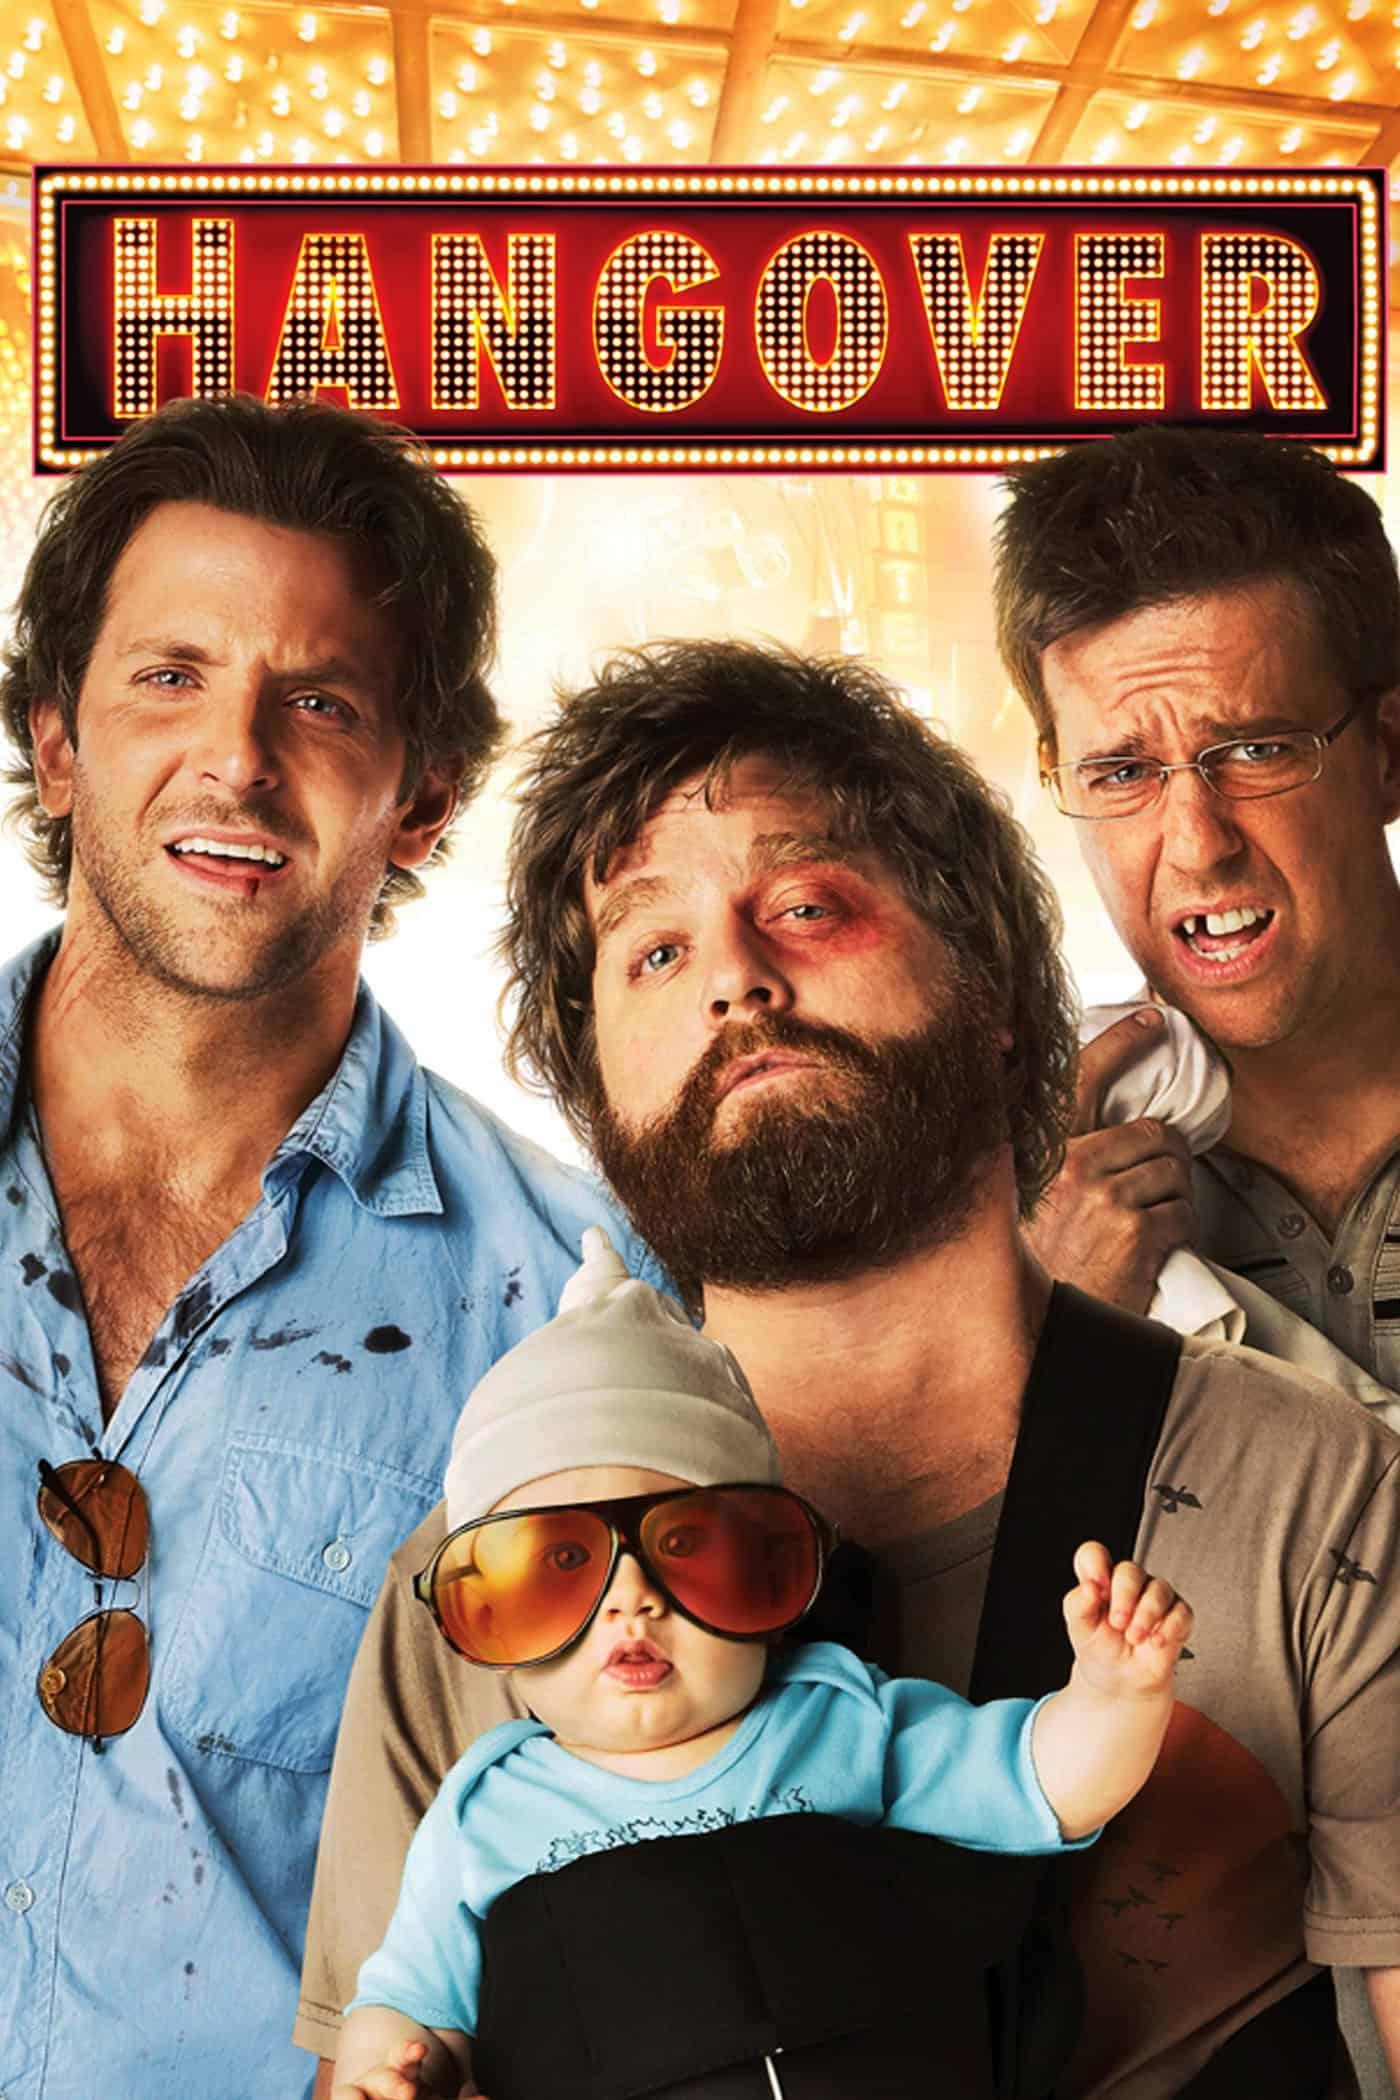 The Hangover, 2009